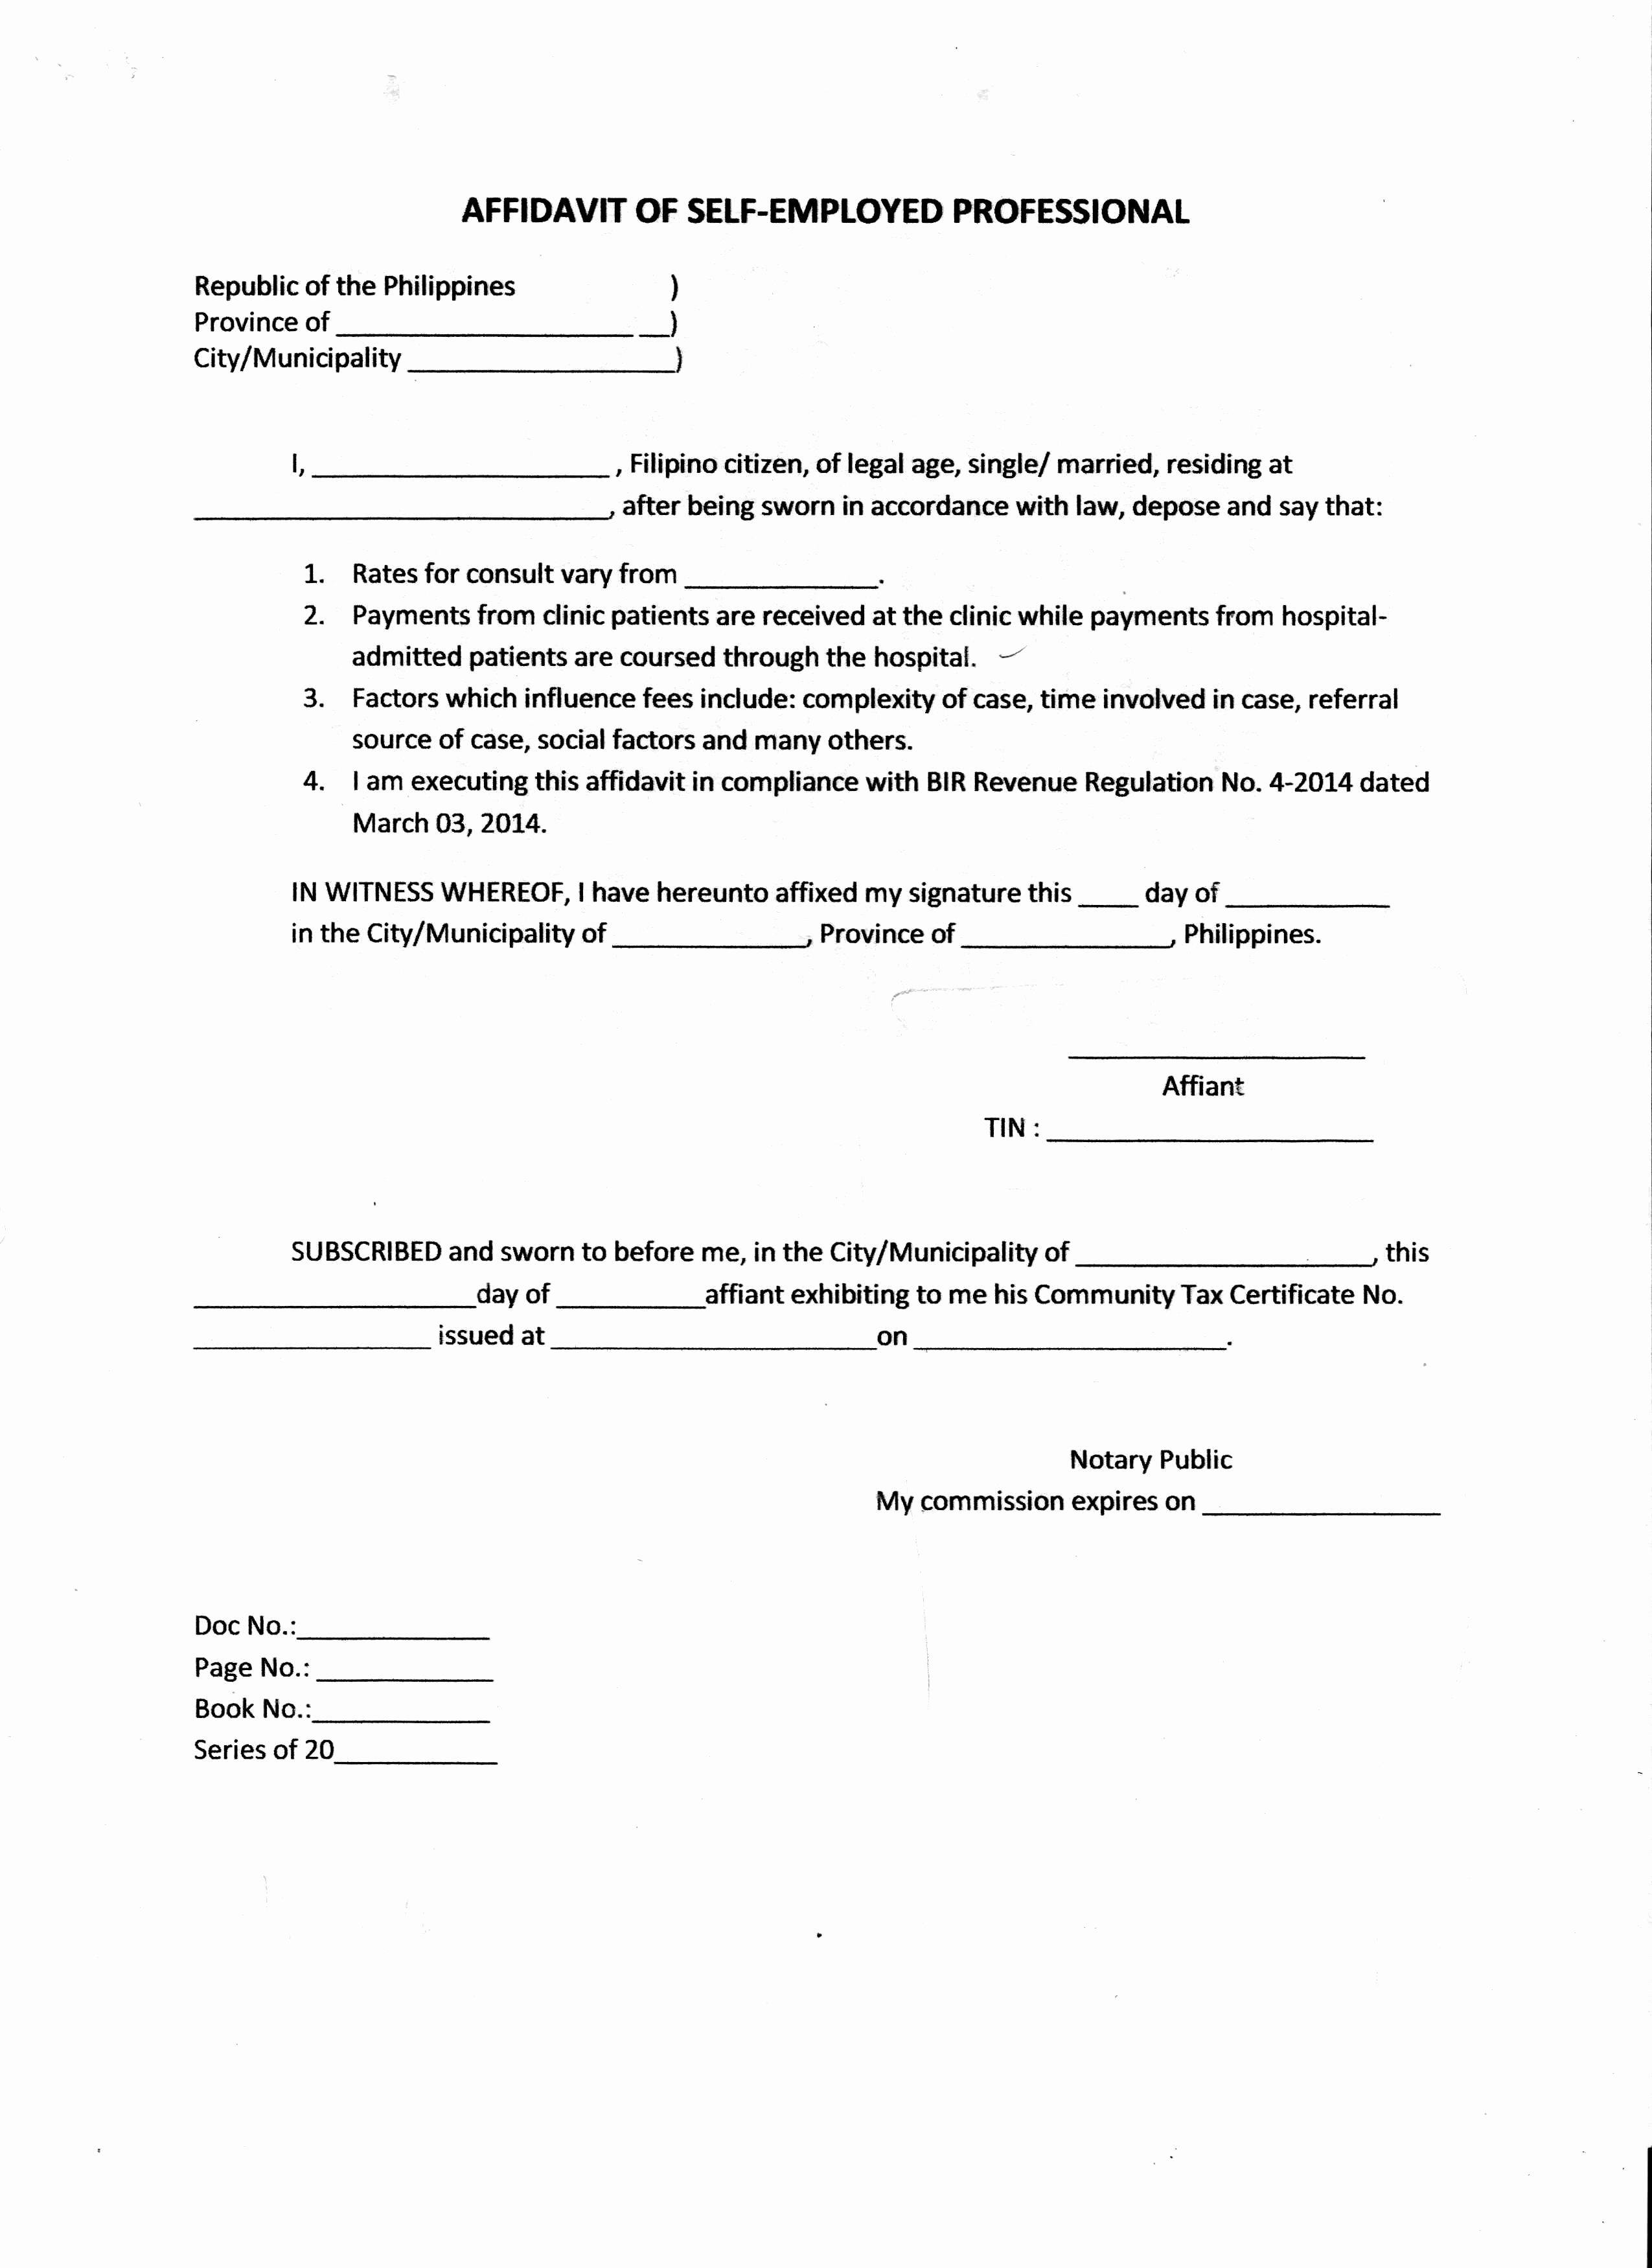 Affidavit Of Support Sample Letter Pdf Best Of Brilliant Affidavit Of Self Employed Professional Sample